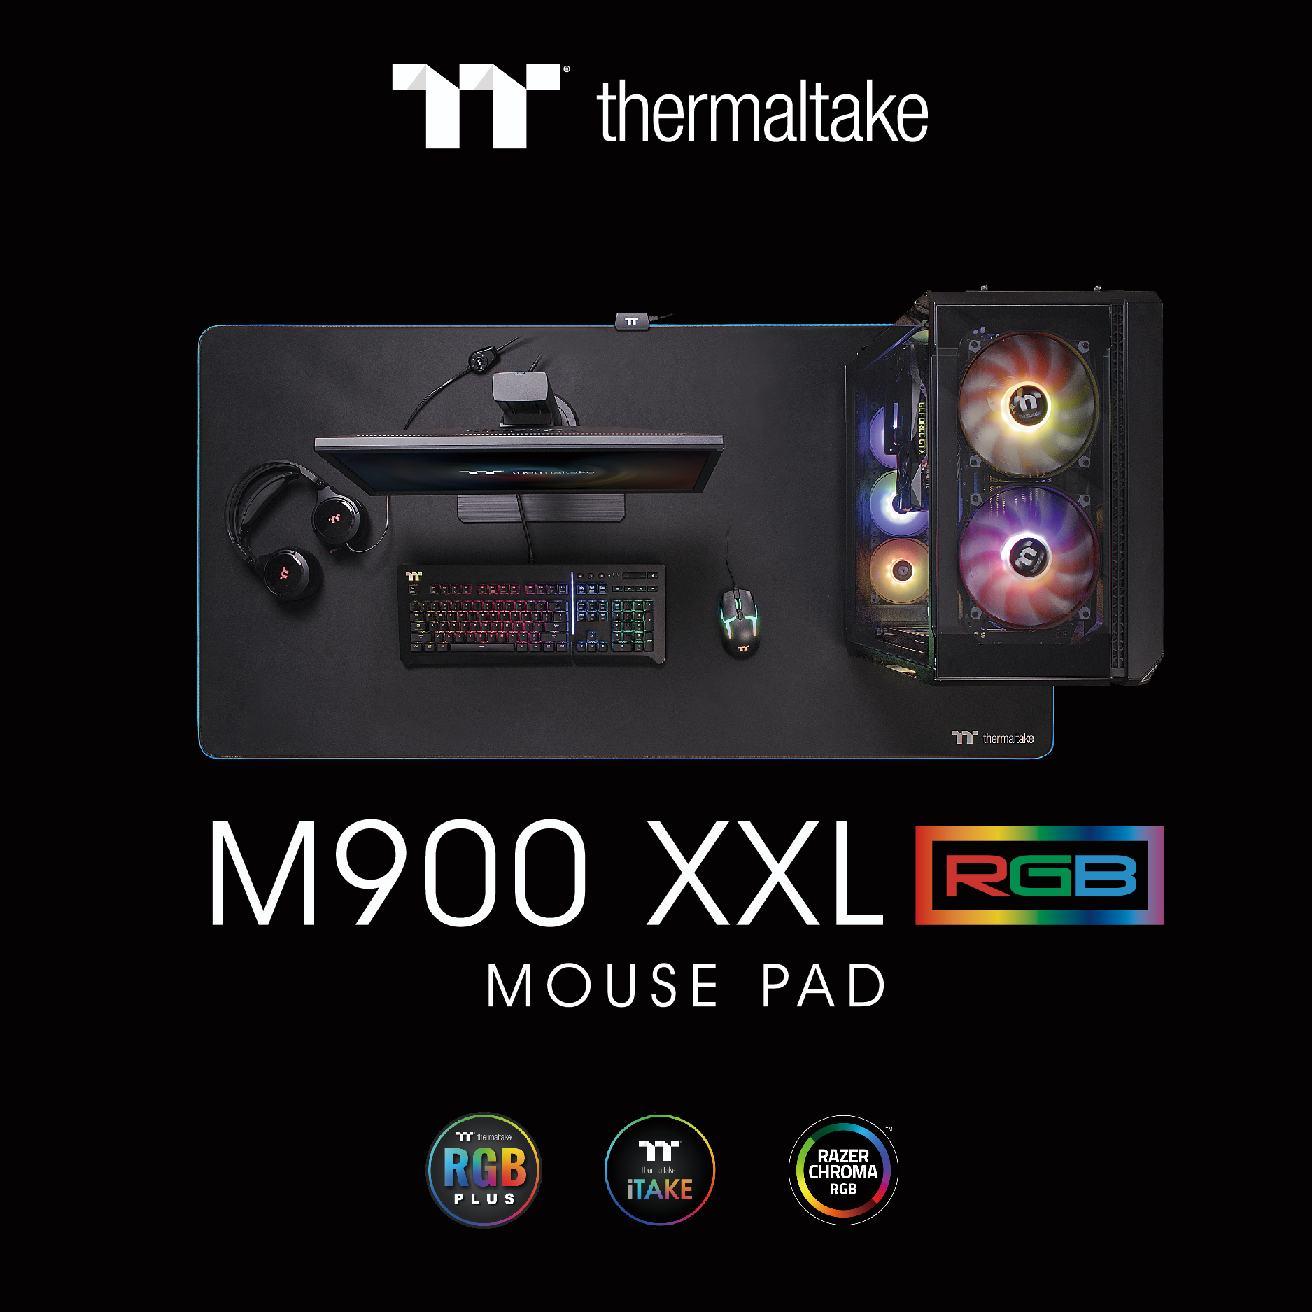 Thermaltake M900 XXL RGB Mouse Pad_1_resize_73